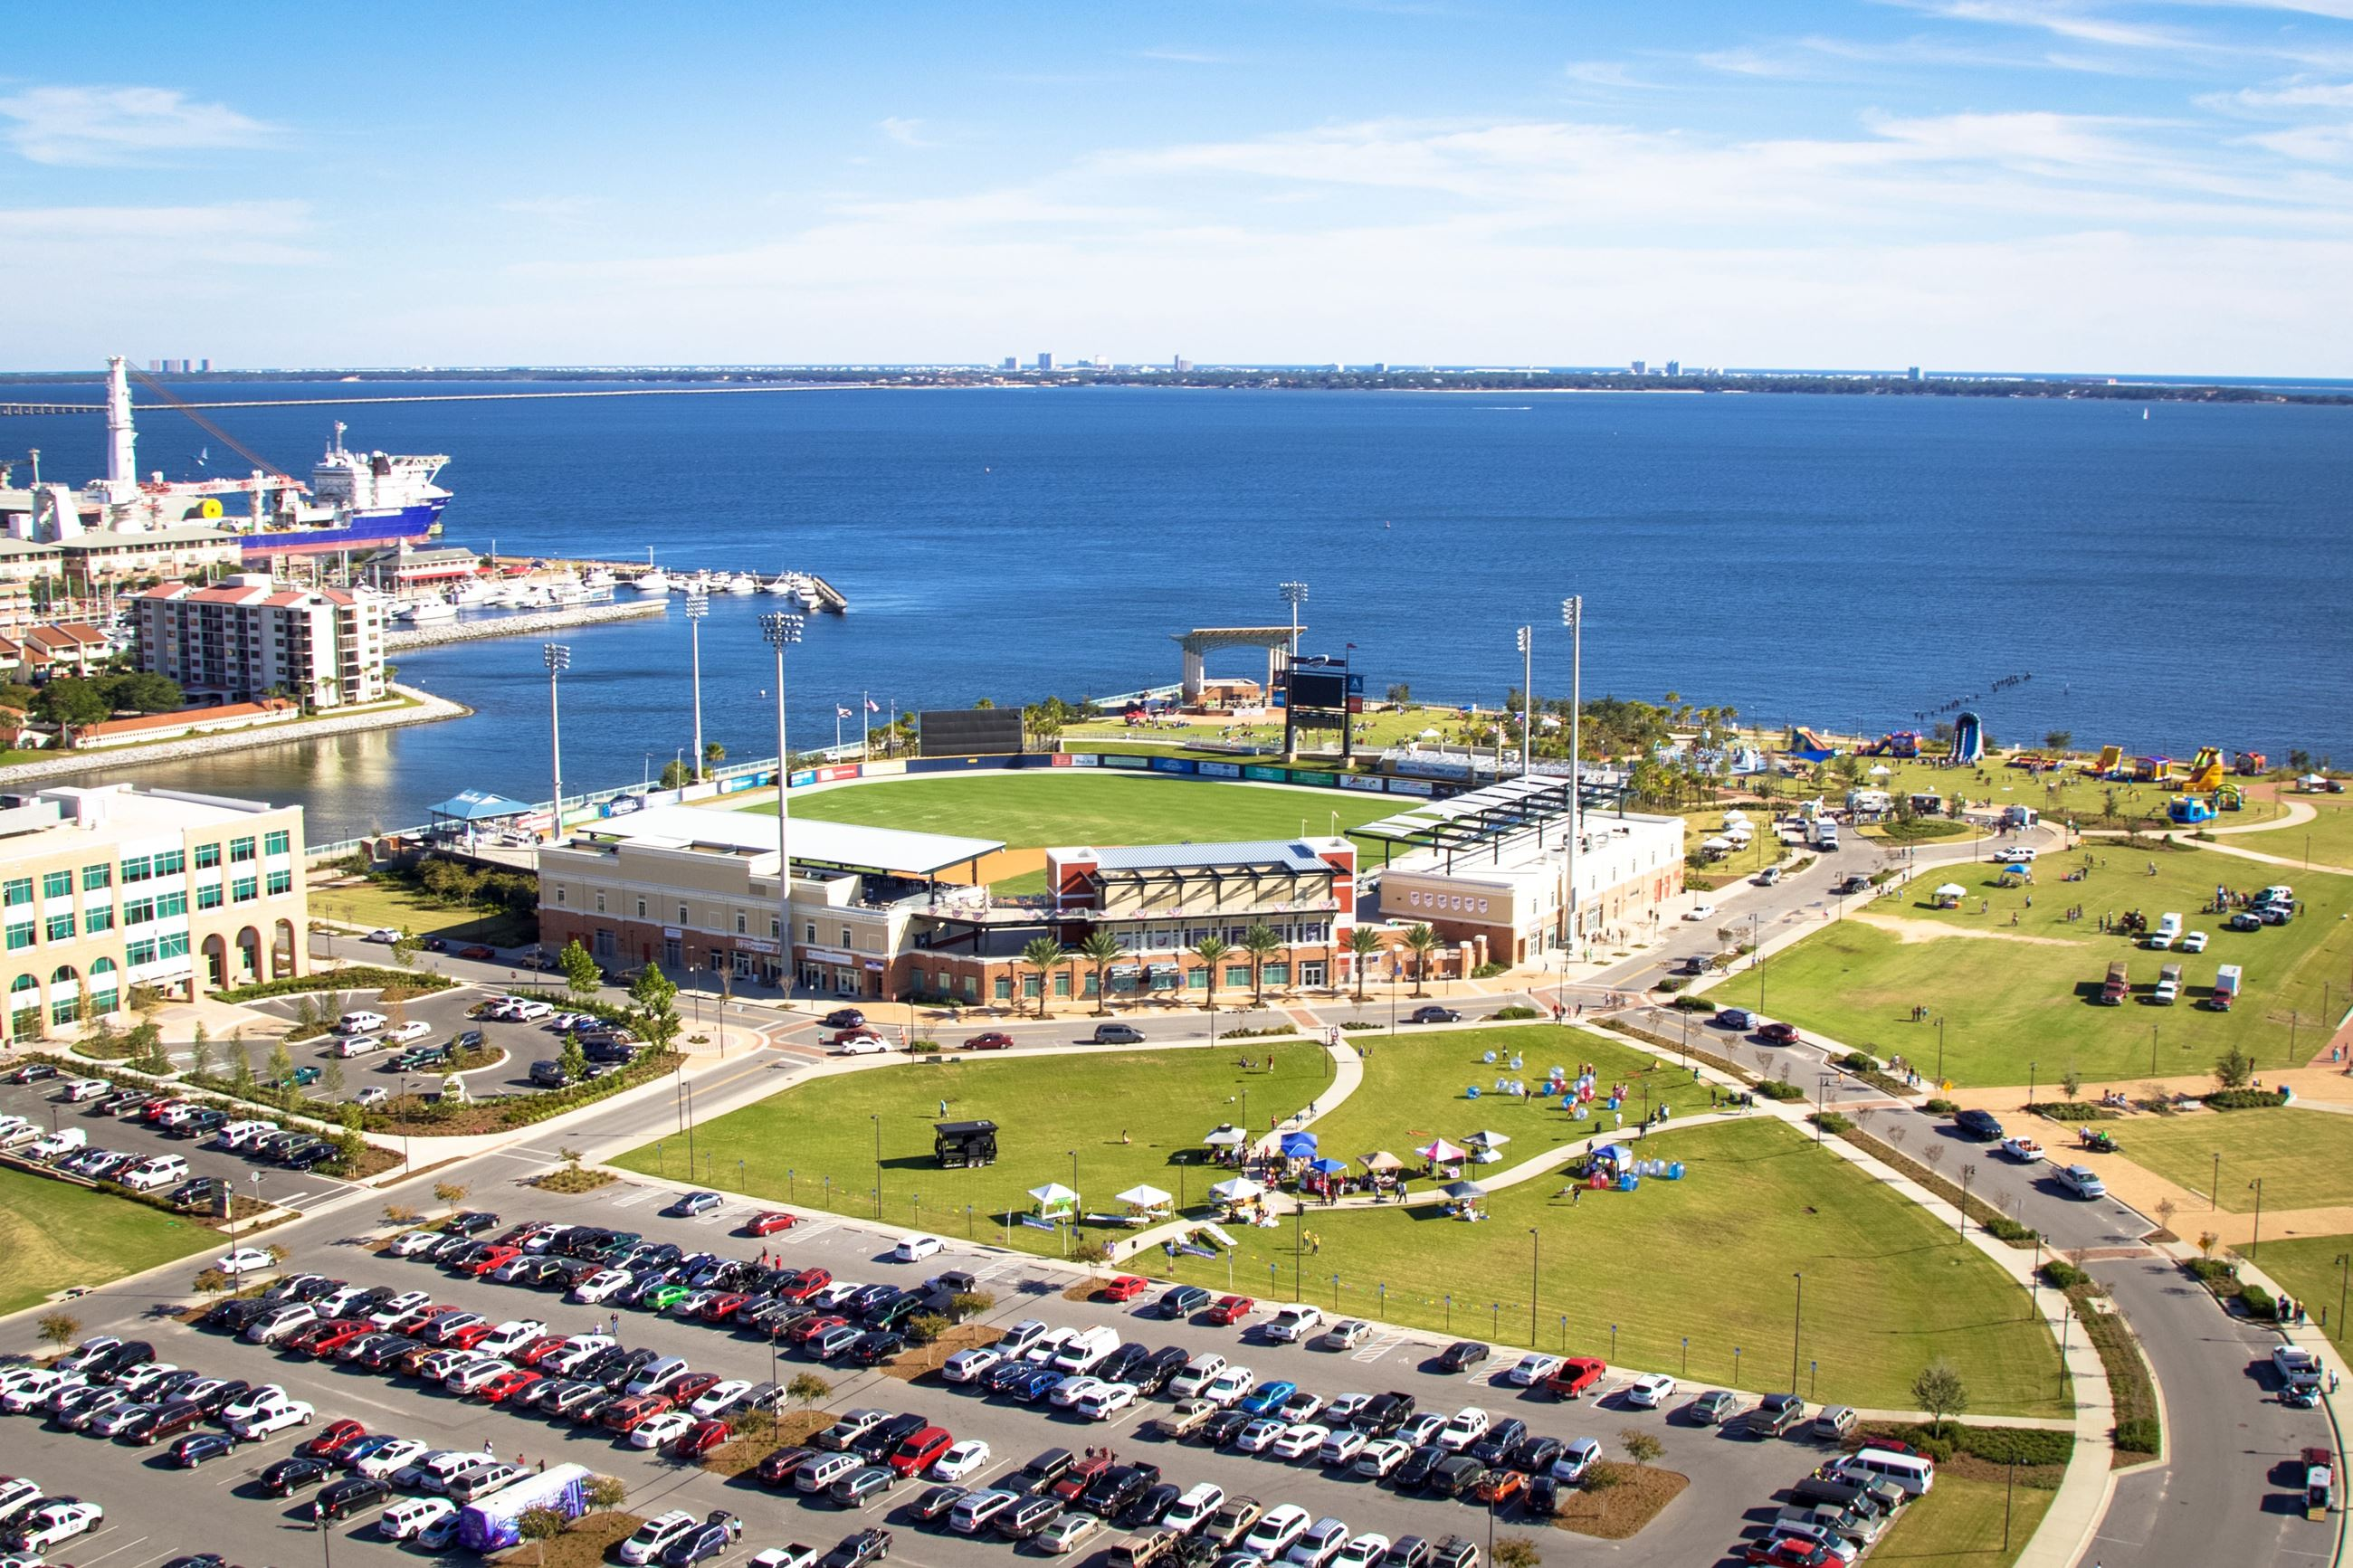 City of Pensacola, Florida Official Website